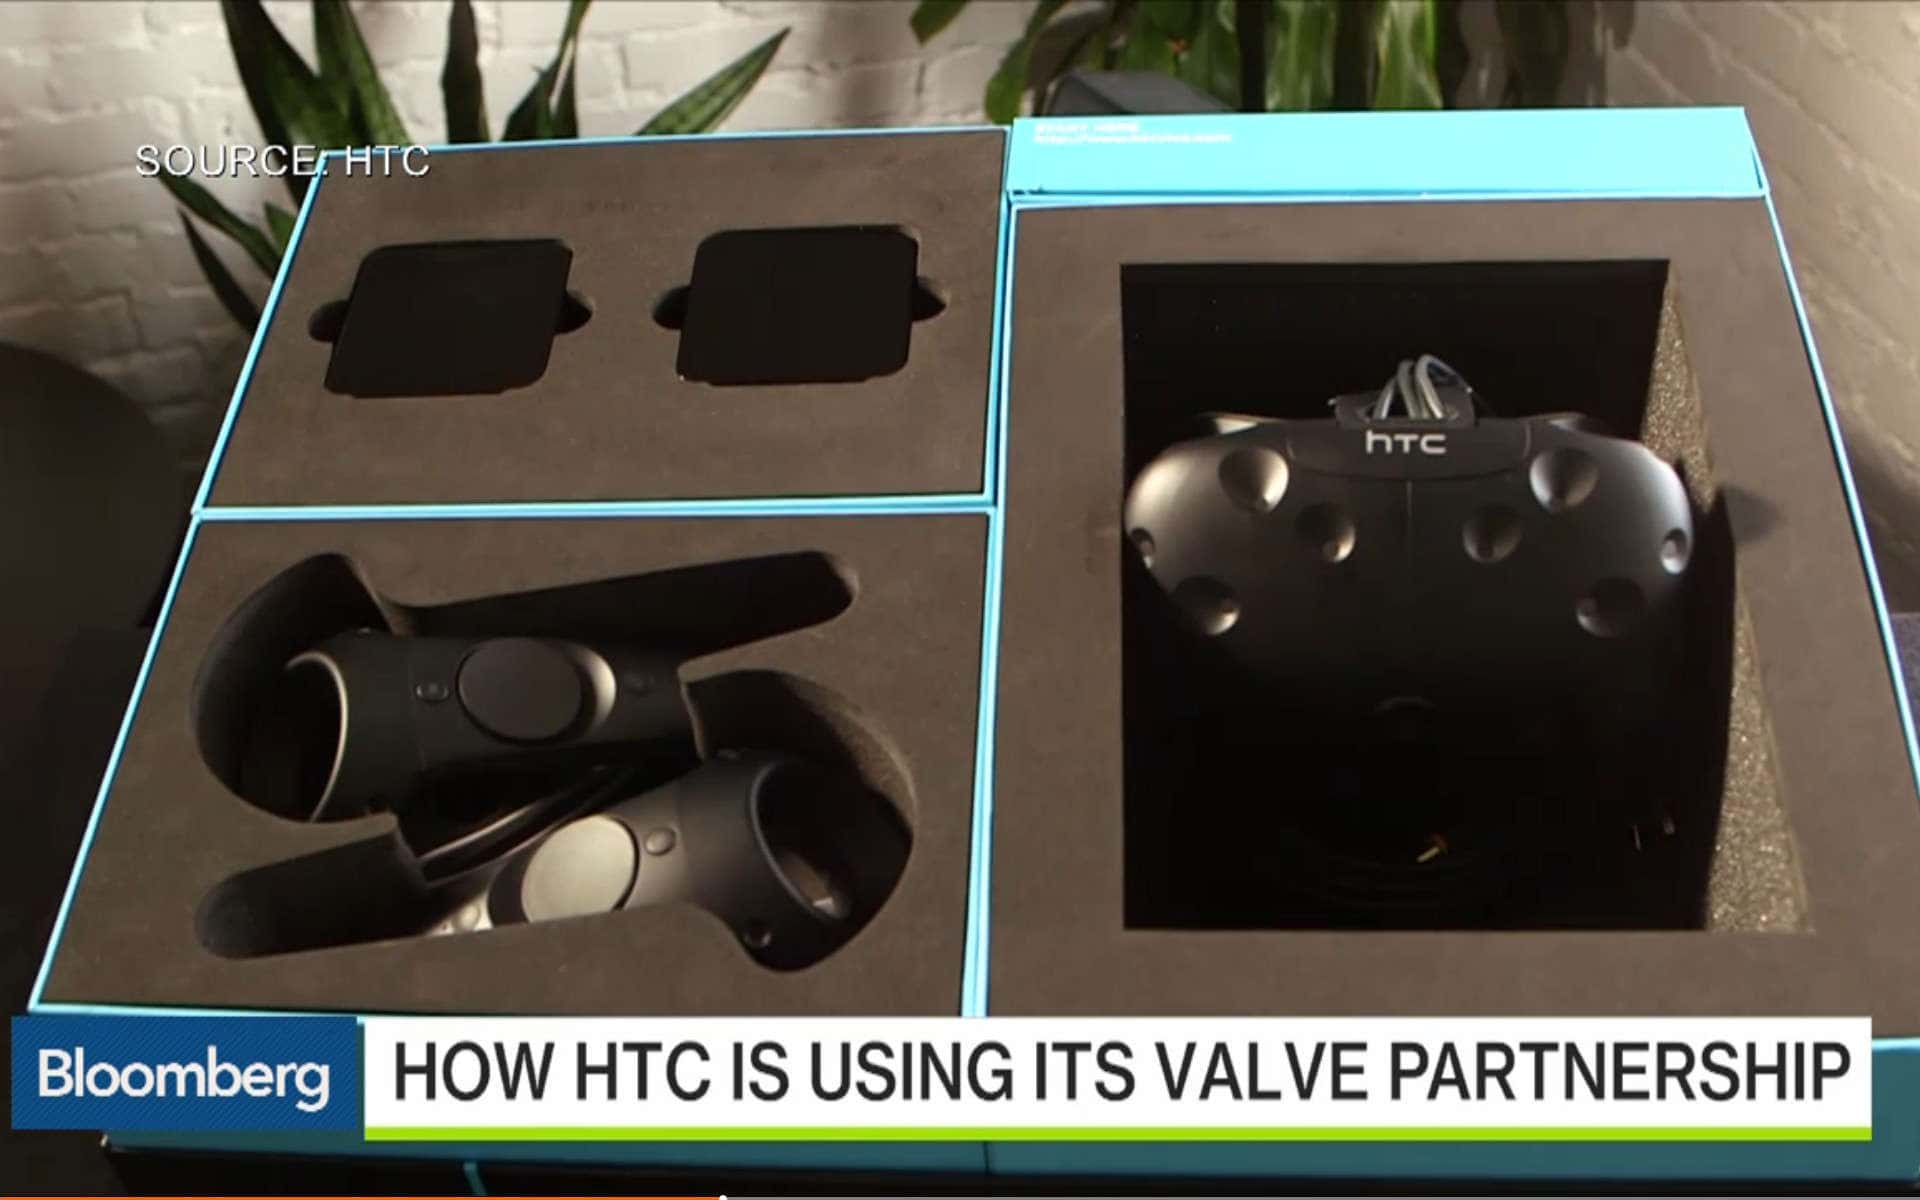 Finale Verpackung der HTC Vive